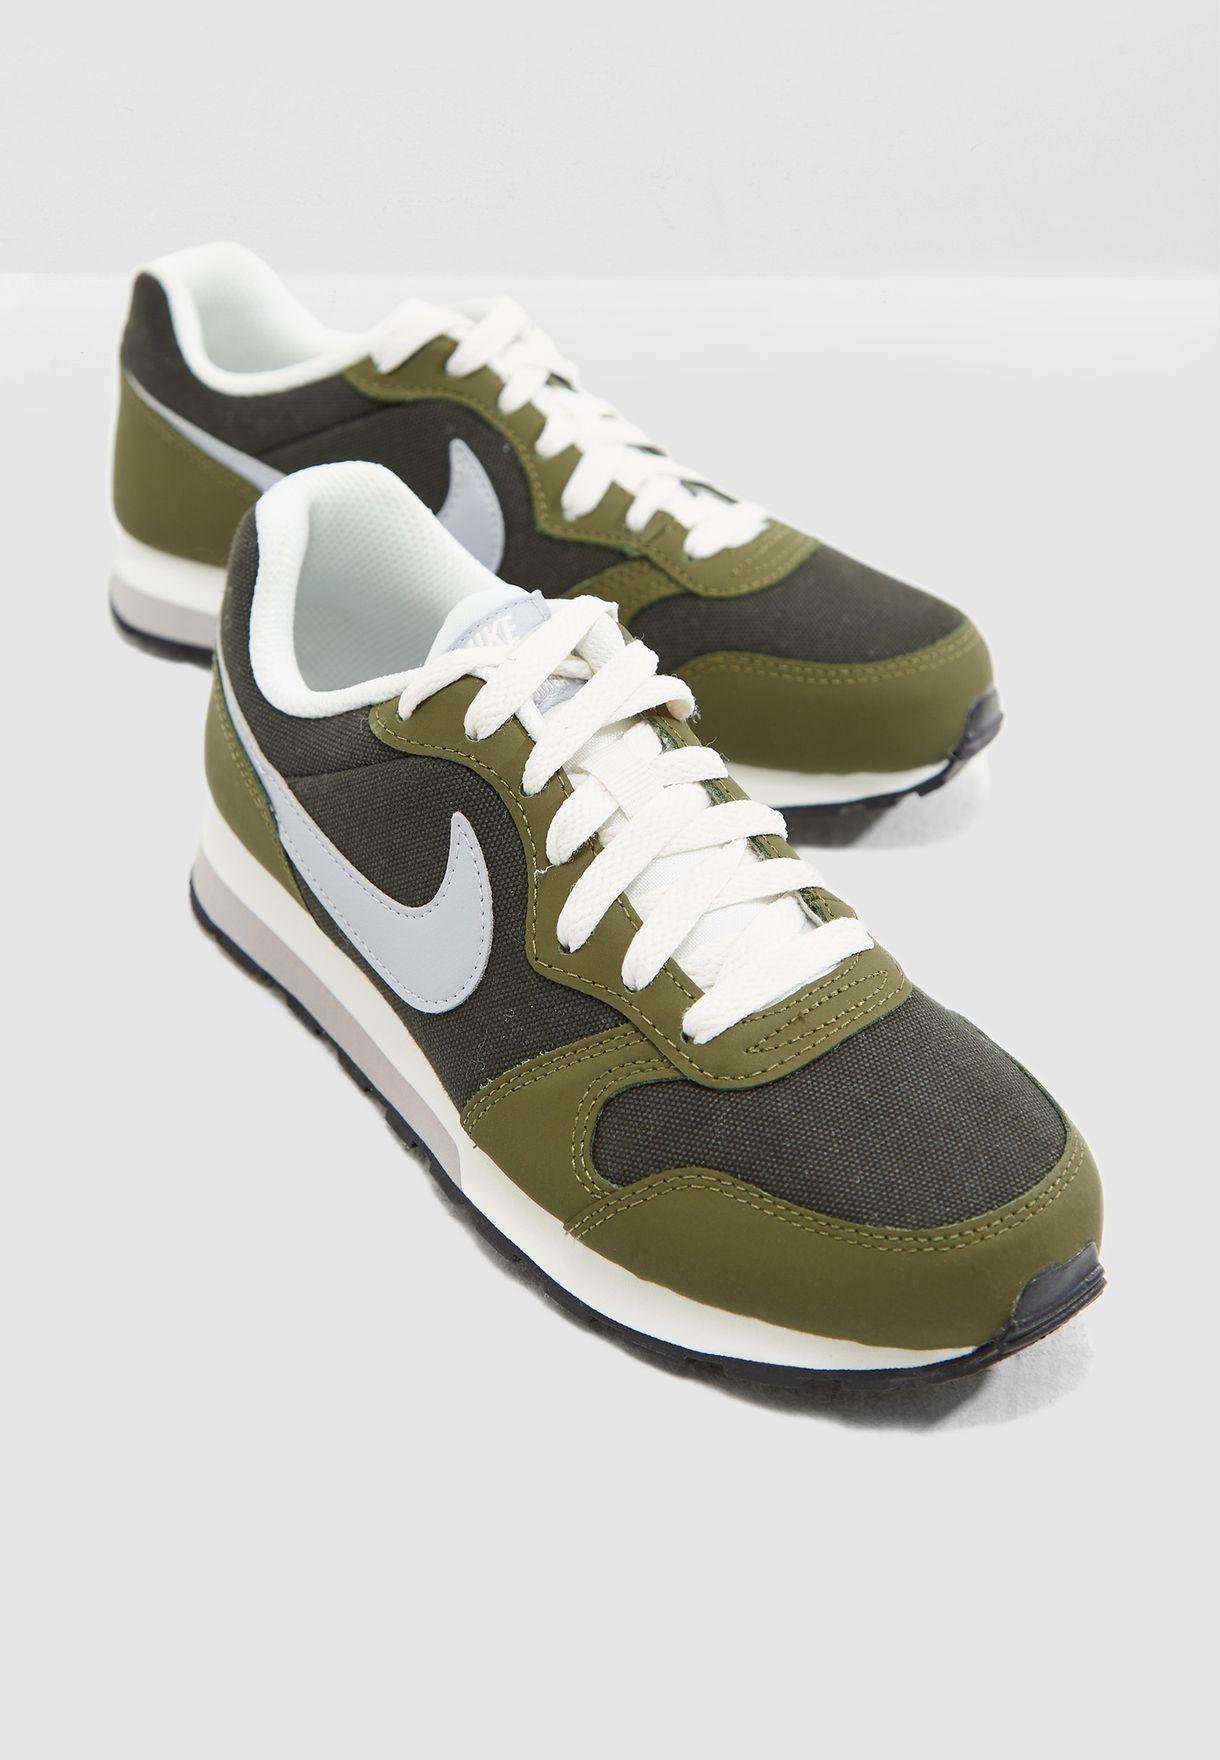 incomparable gran surtido elige el más nuevo Buy Nike green Youth MD Runner 2 for Kids in Riyadh, Jeddah | 807316-301